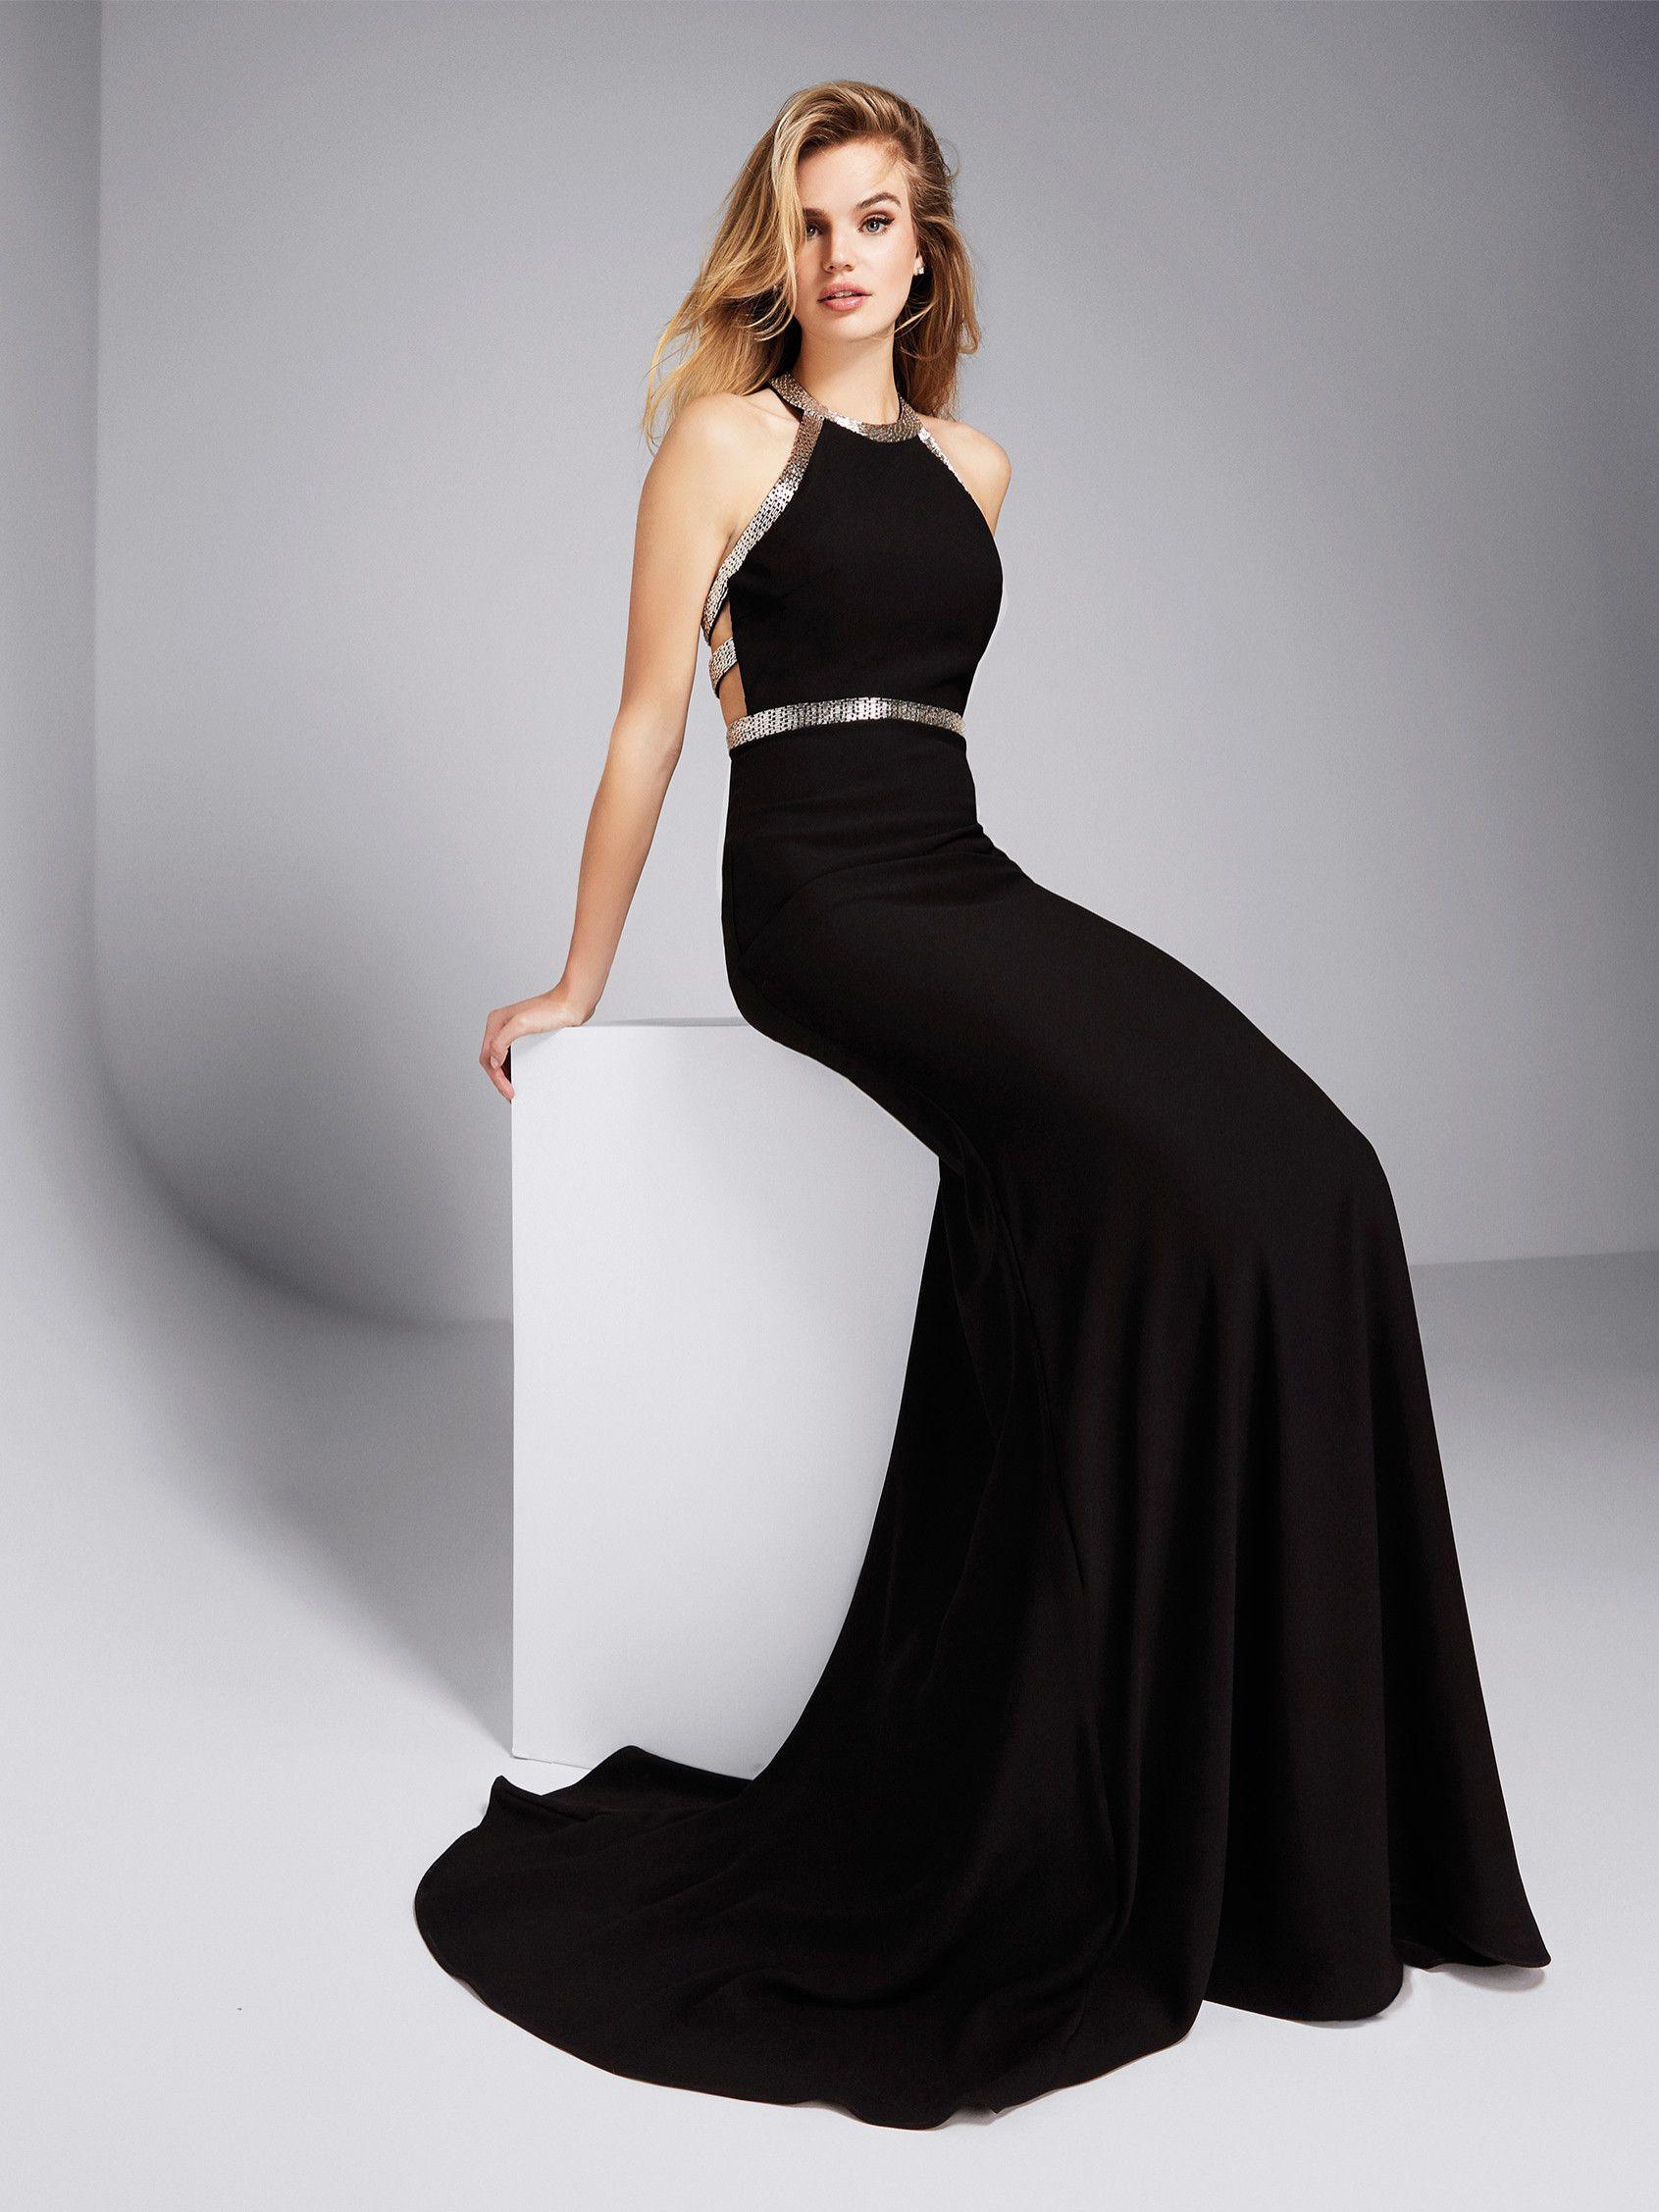 Comprar vestidos largos boda